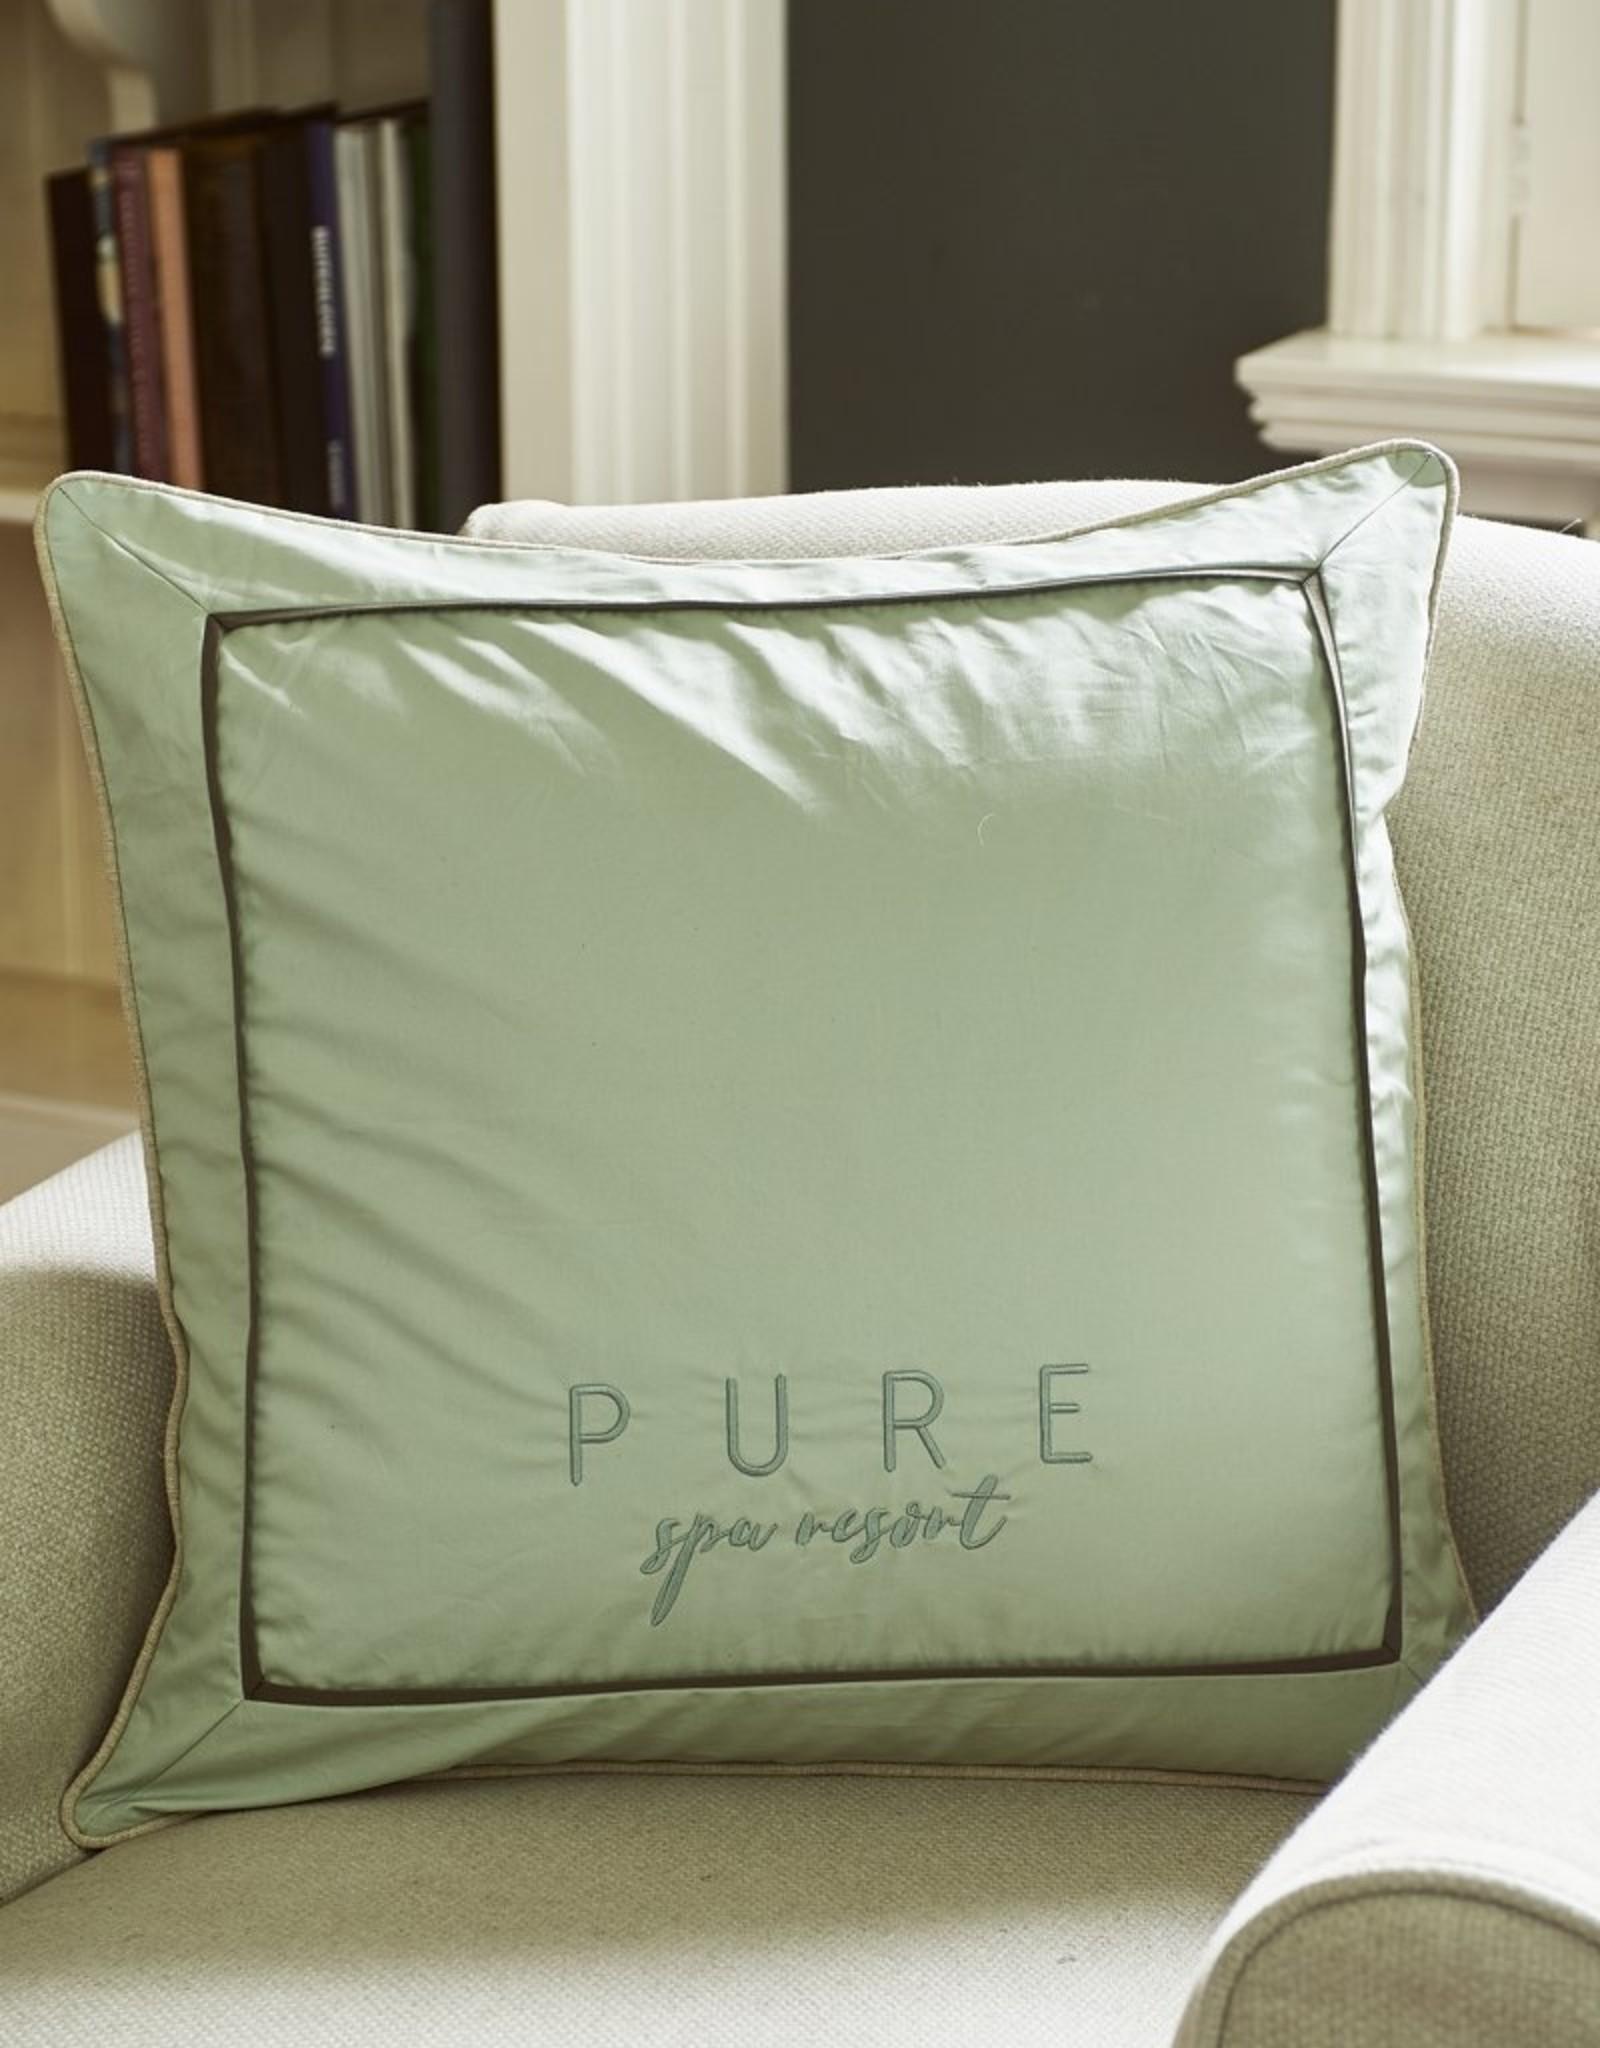 Riviera Maison Pure Spa Resort green 60x60